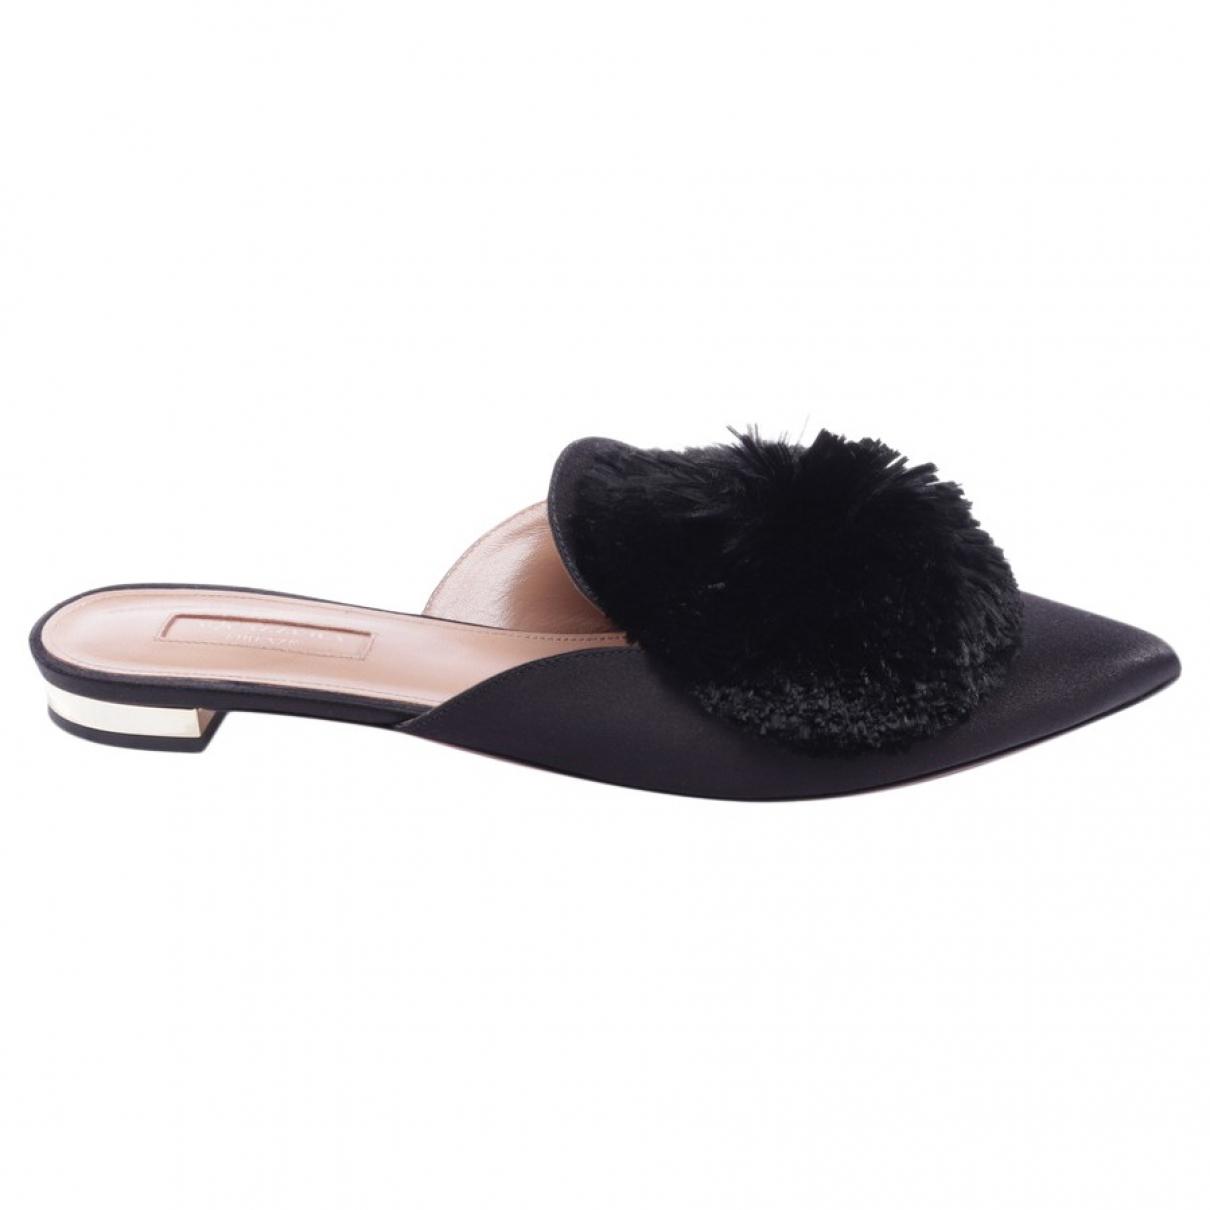 Aquazzura \N Black Leather Sandals for Women 38 EU